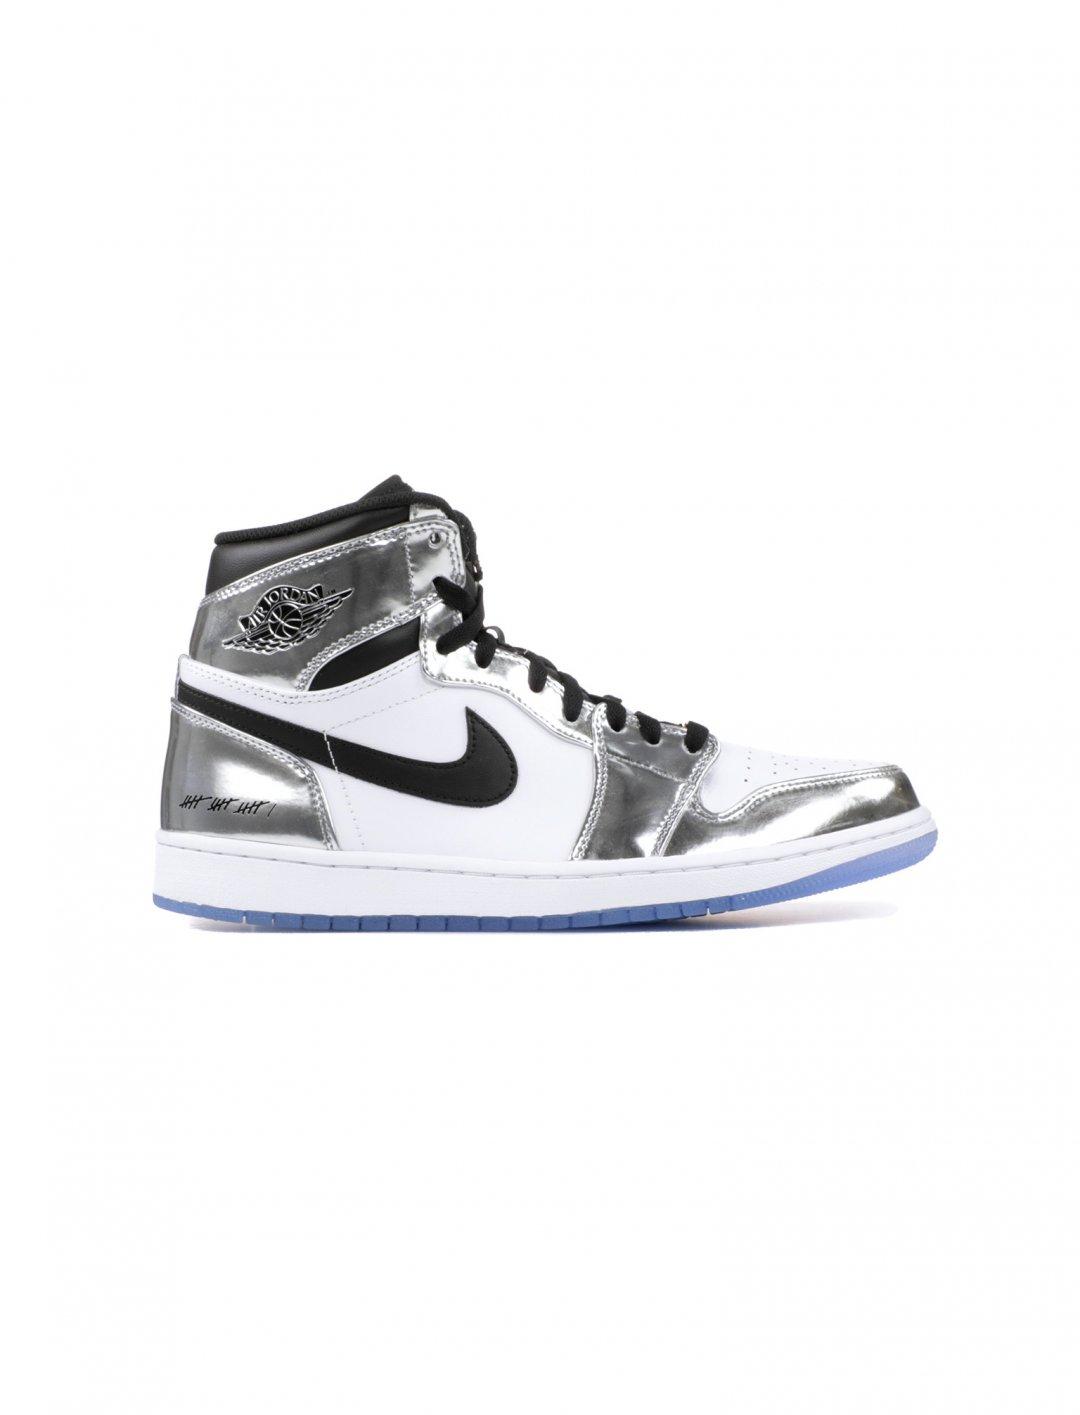 "DJ Khaled's Air Jordan Trainers {""id"":12,""product_section_id"":1,""name"":""Shoes"",""order"":12} Air Jordan"